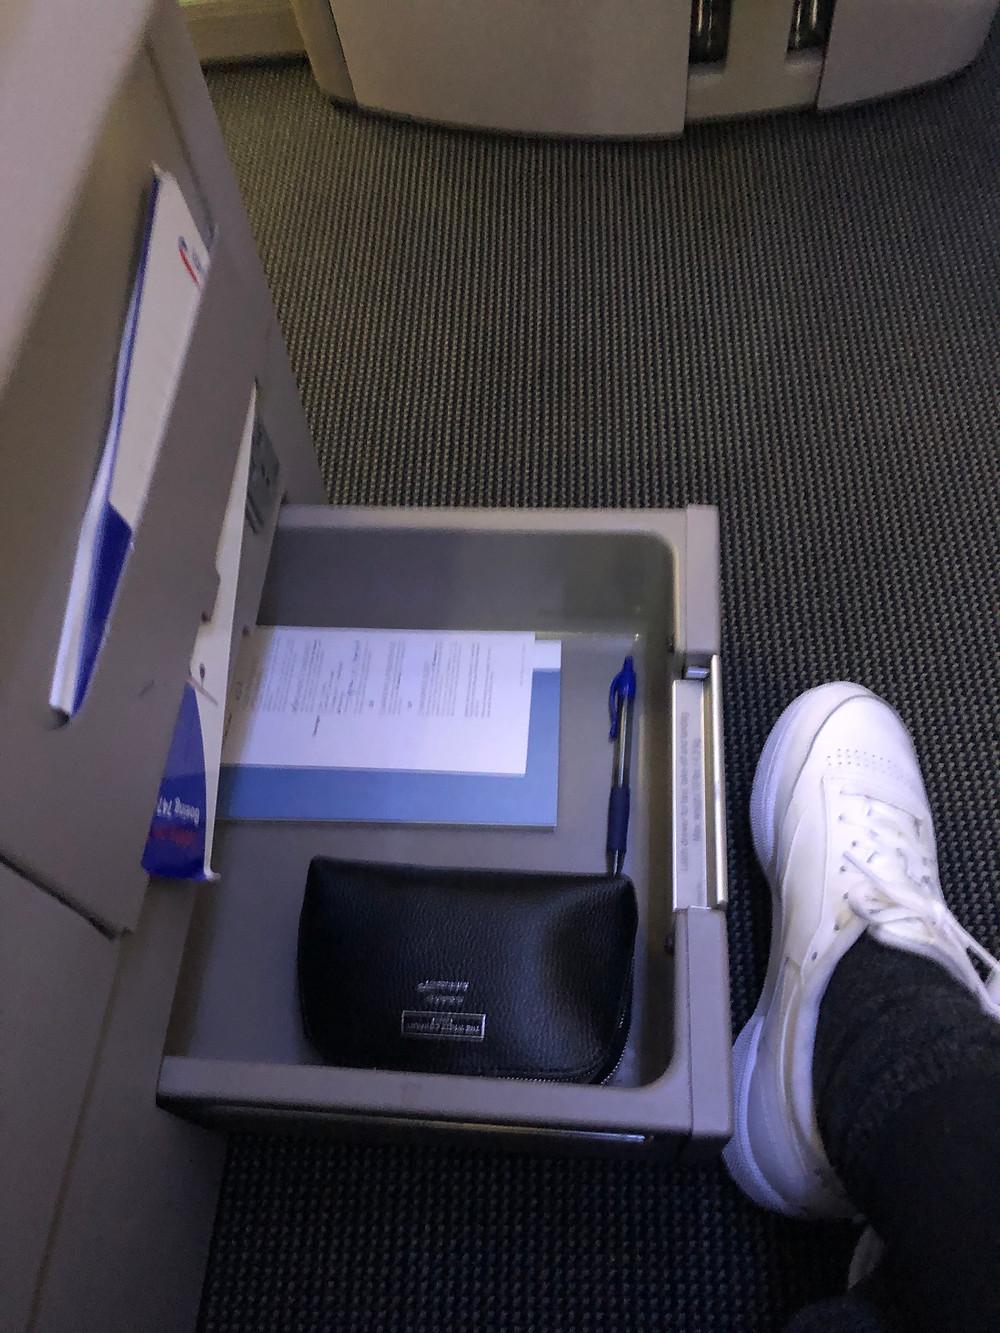 Lower drawer on Club World British Airways seat.  Has The White Company amenity kit